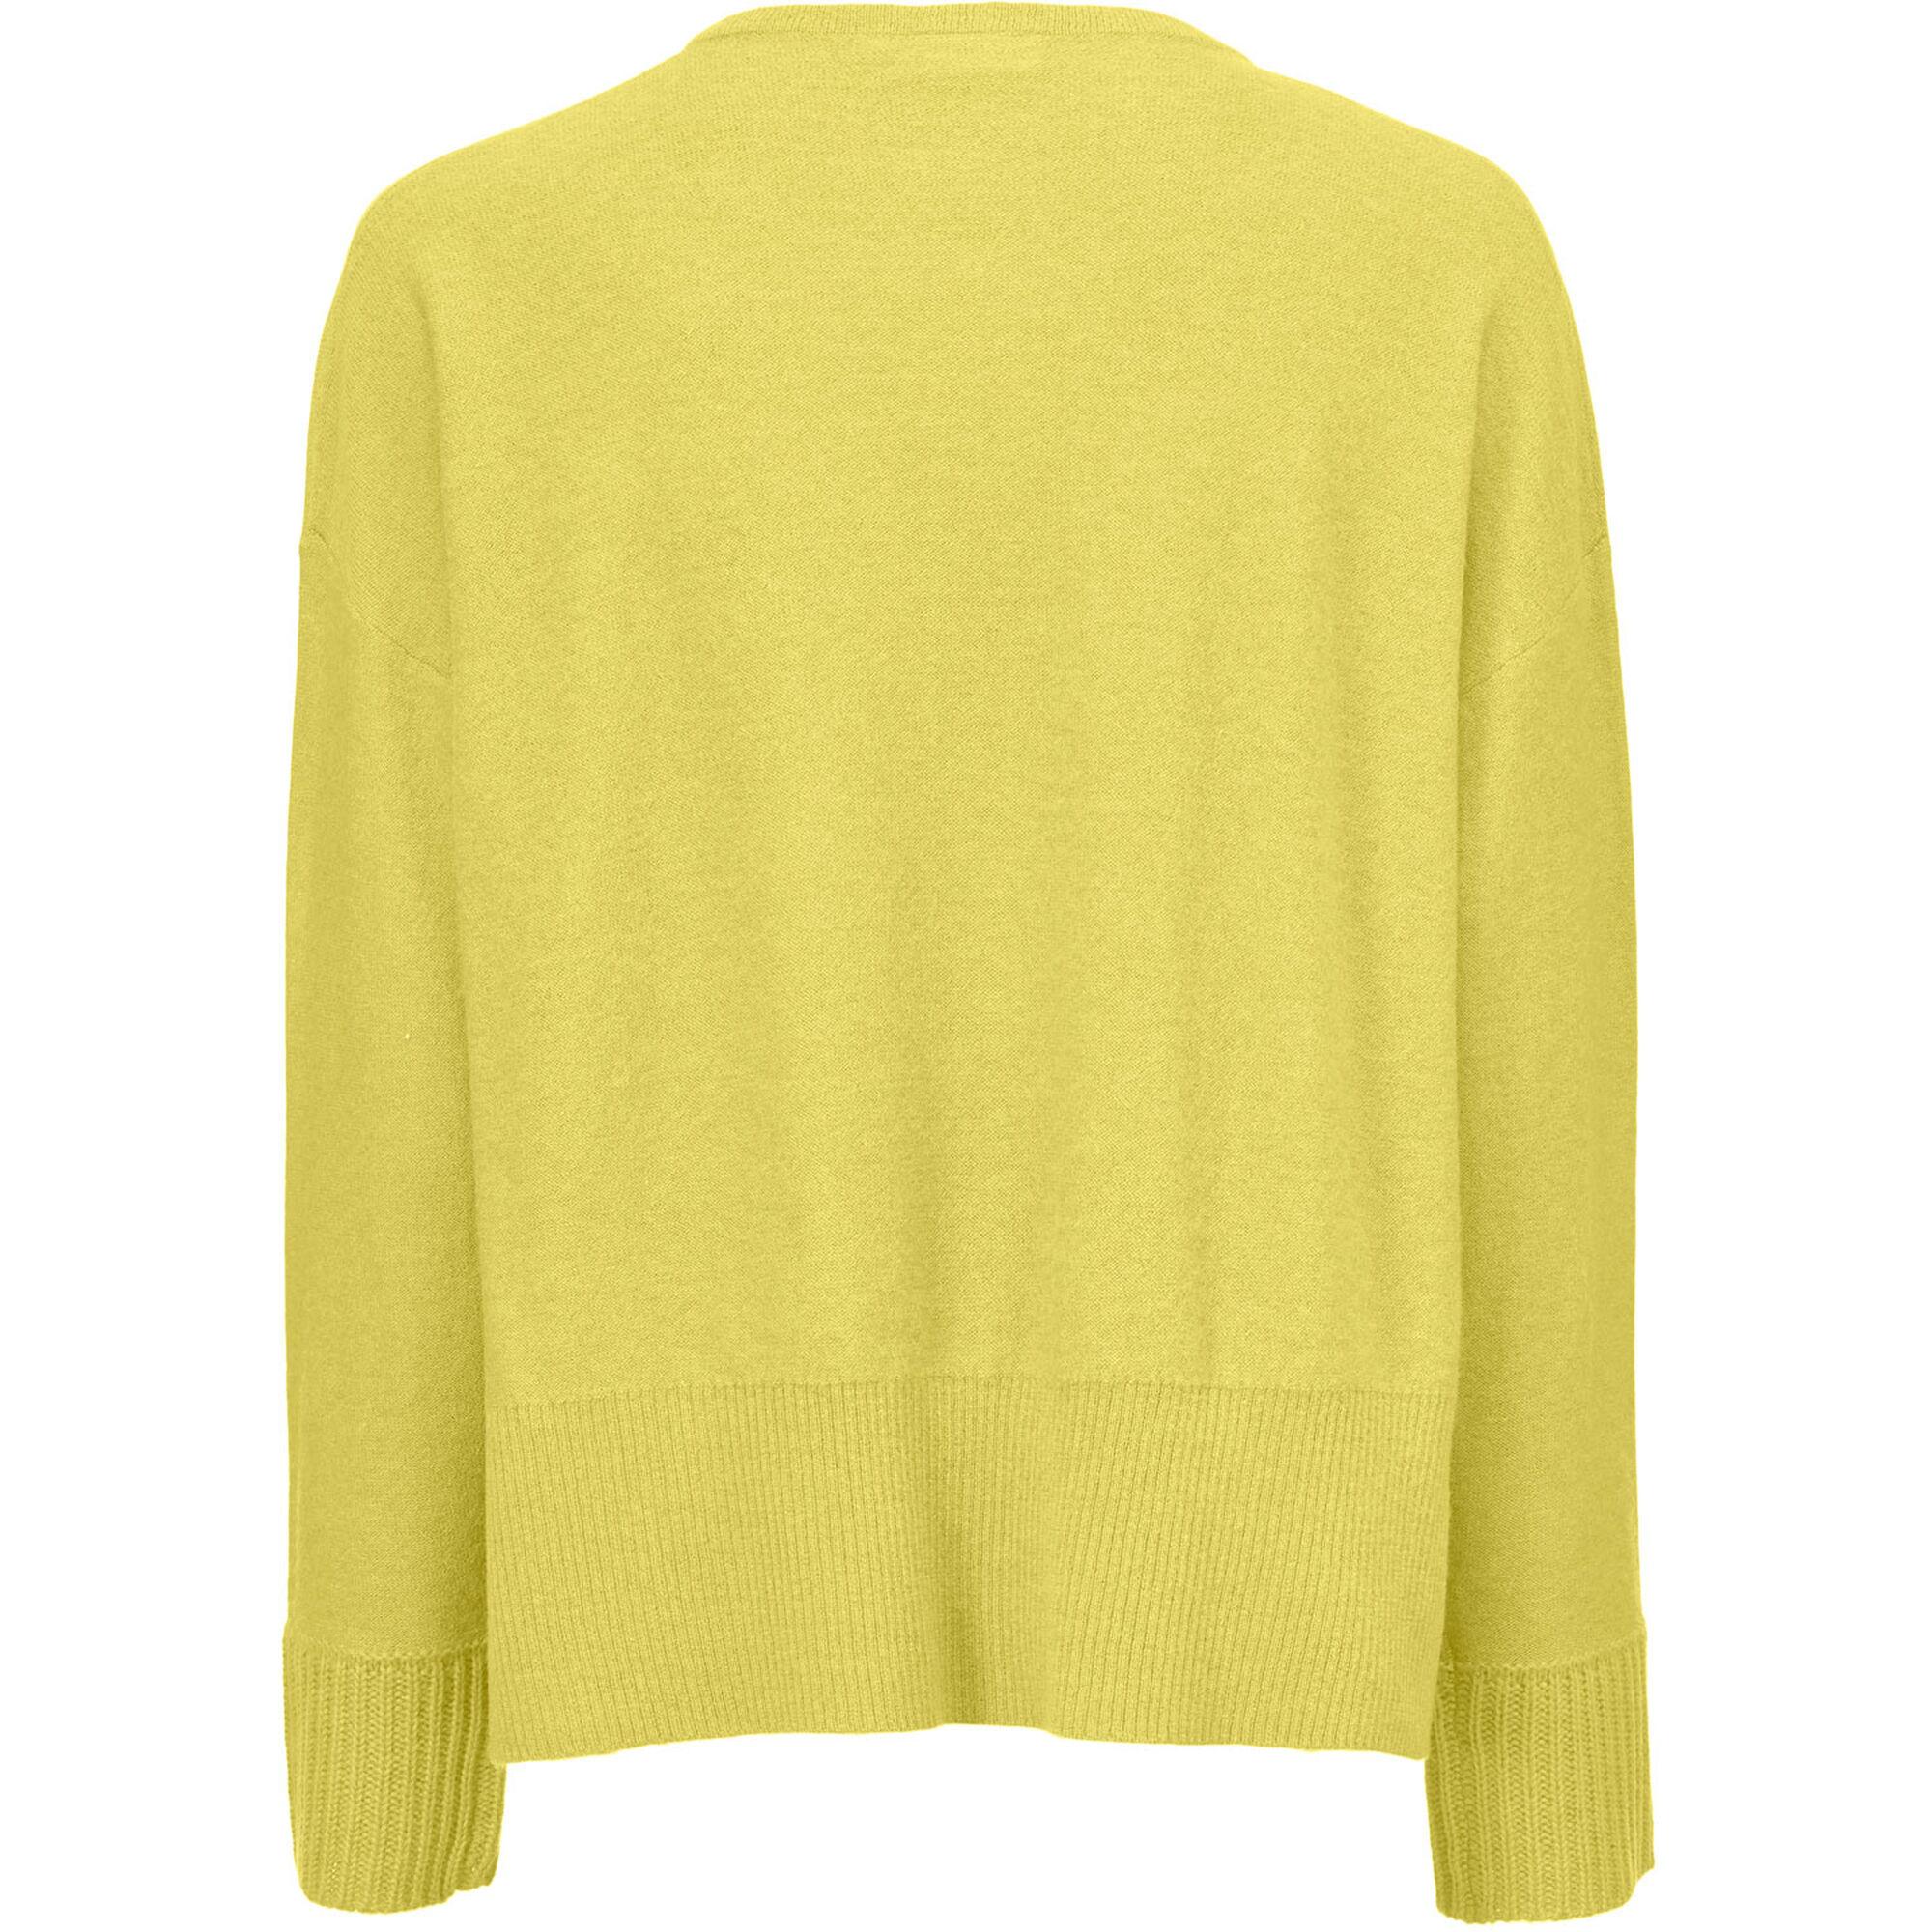 LEANN CARDIGAN, Oil Yellow, hi-res